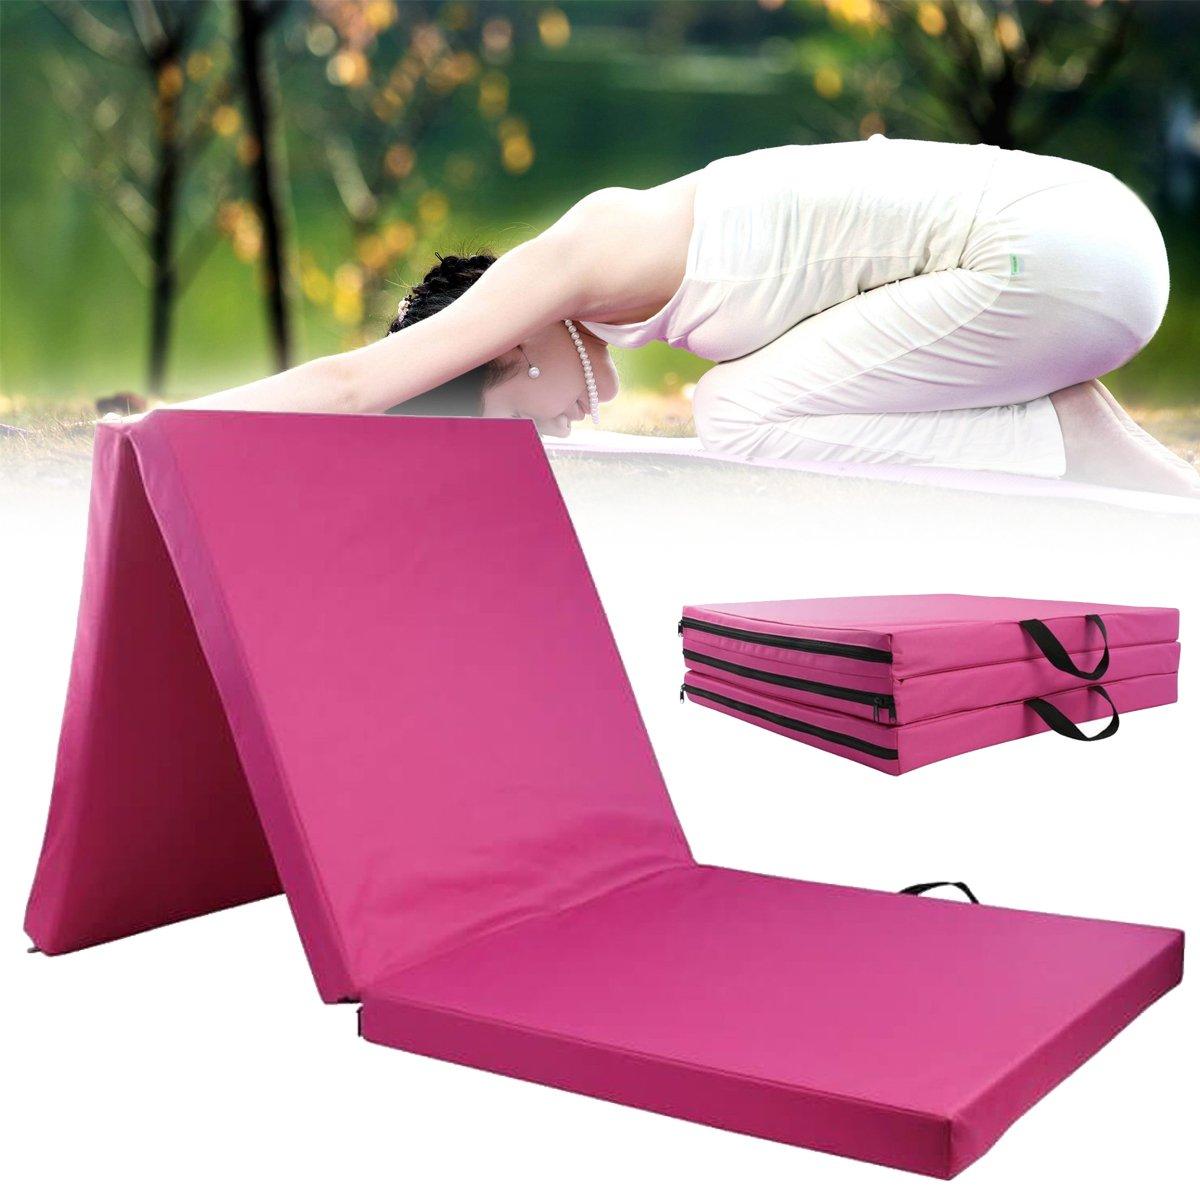 Plat Feste Gymnastikmatte 3 Faltbare Paneele Yogamatten Aerobic Training Tumbling Rolling Sport Schutzpolster